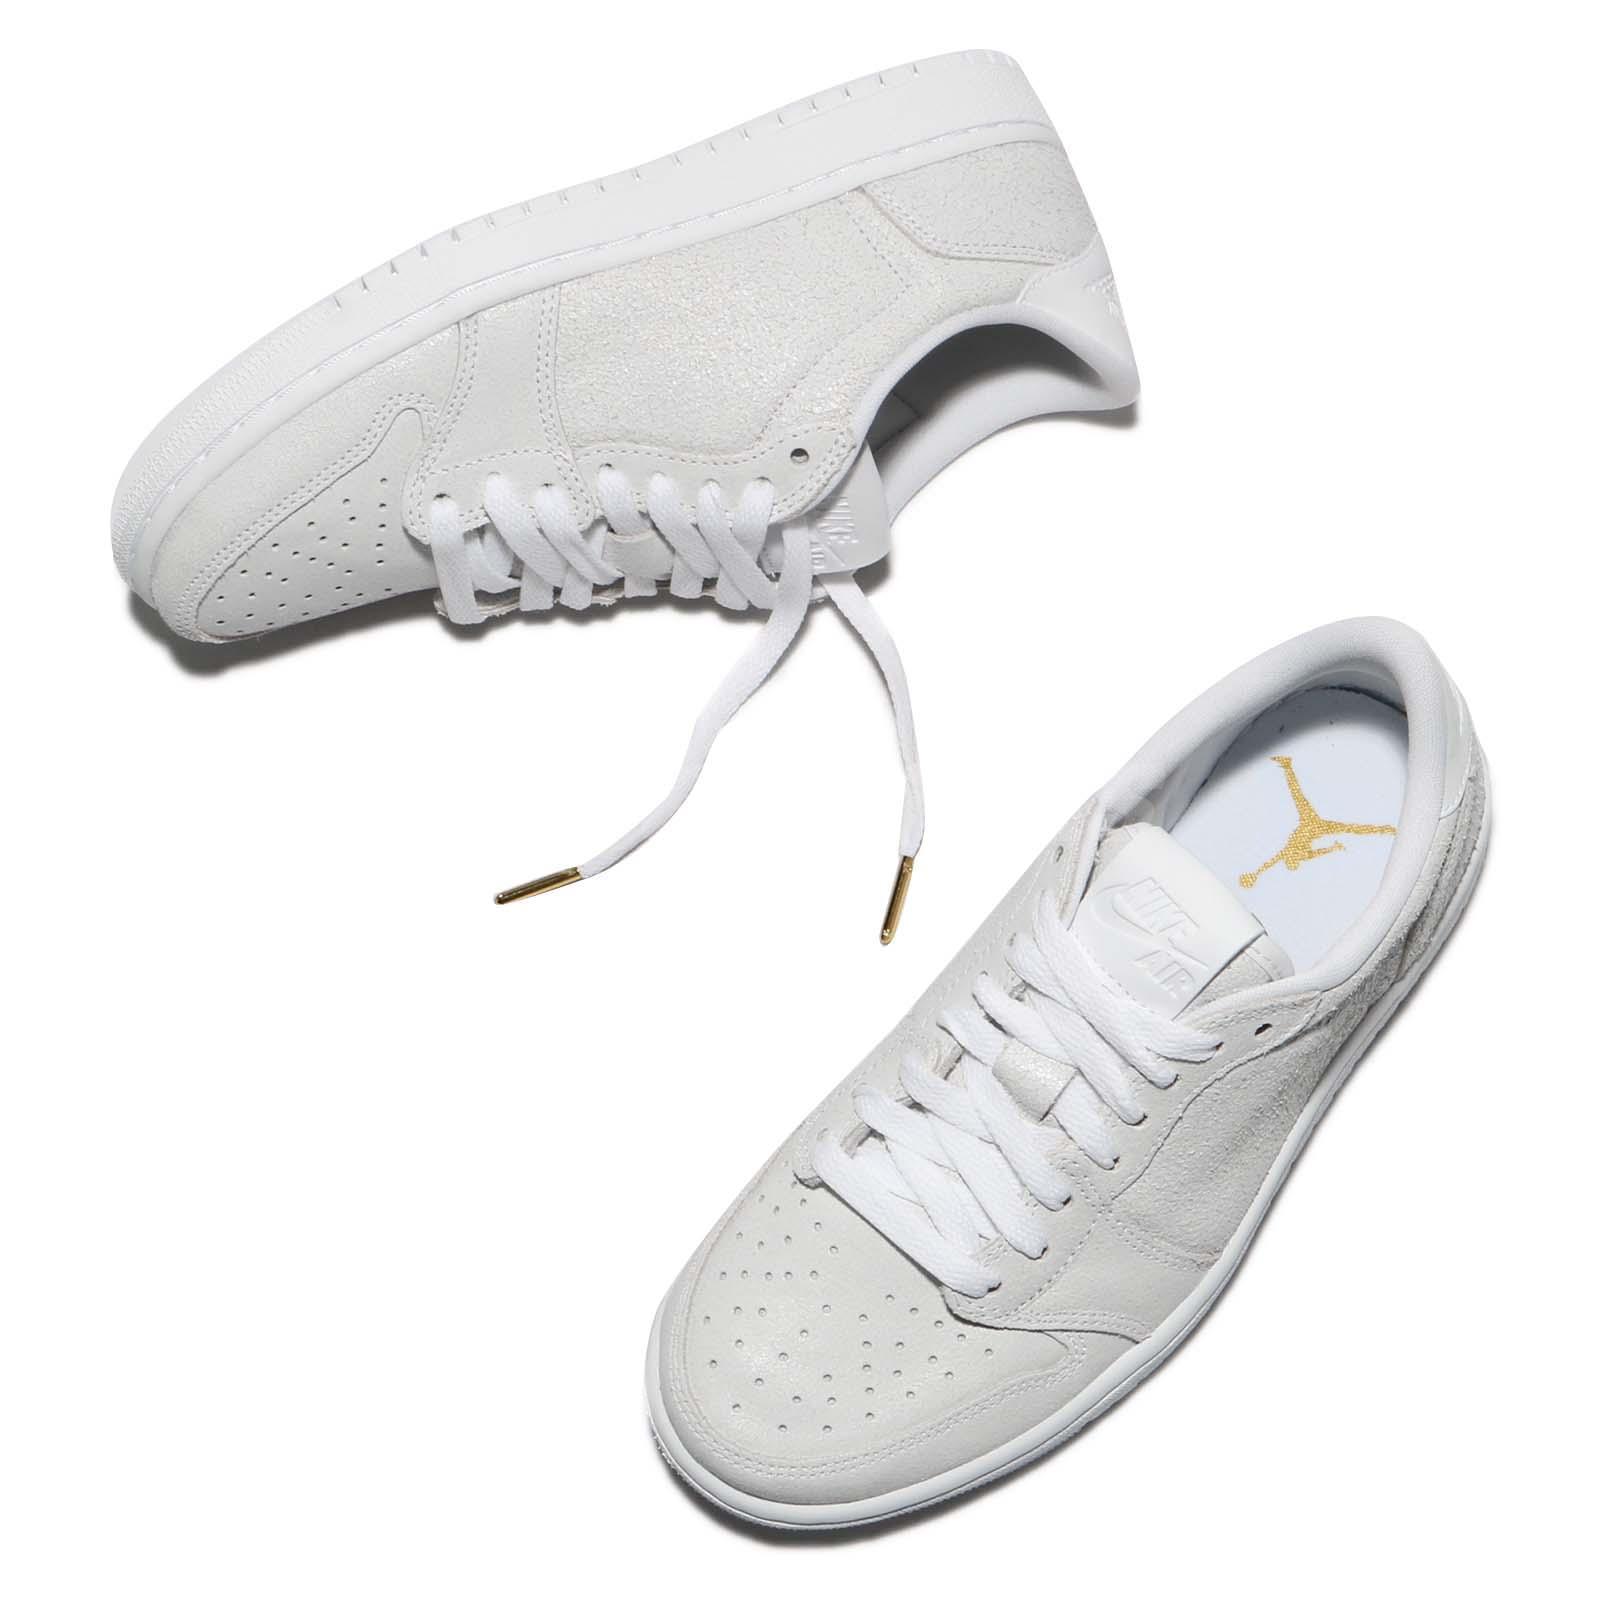 Athletic Shoes Responsible Nike Wmns Air Jordan 1 Retro Low Ns No Swoosh White Grey Women Shoes Ah7232-100